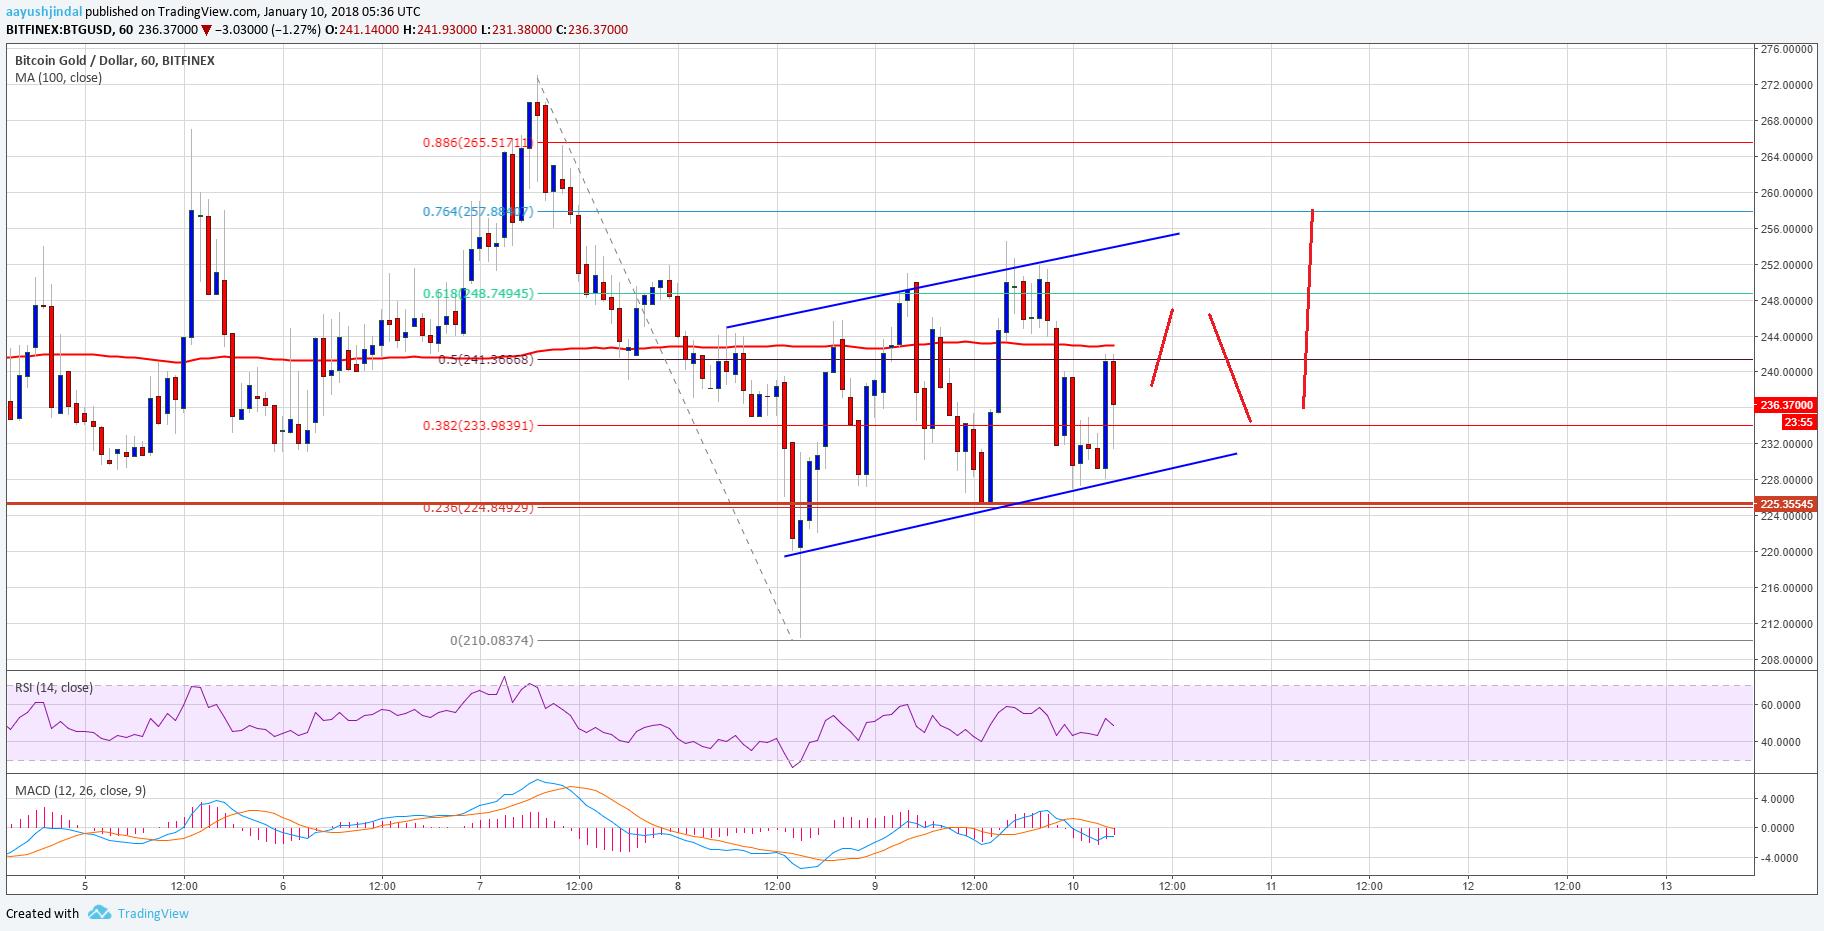 Bitcoin Gold Price Technical Analysis – BTG/USD Holding $220